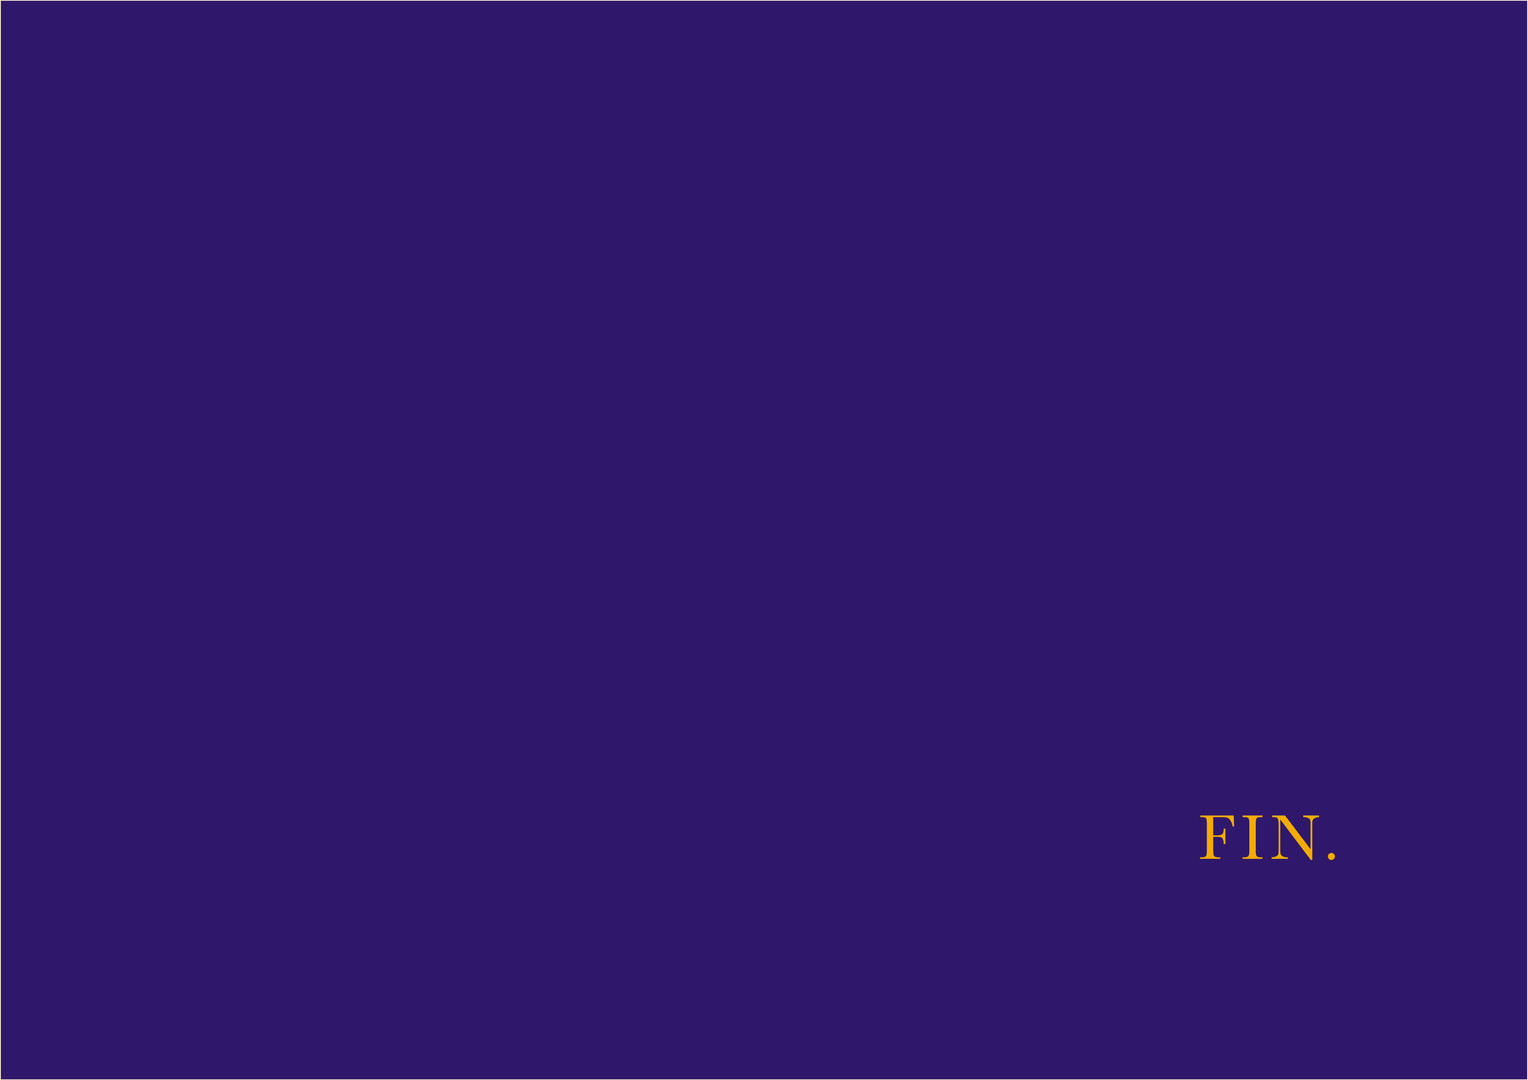 guideline-fin26.jpg